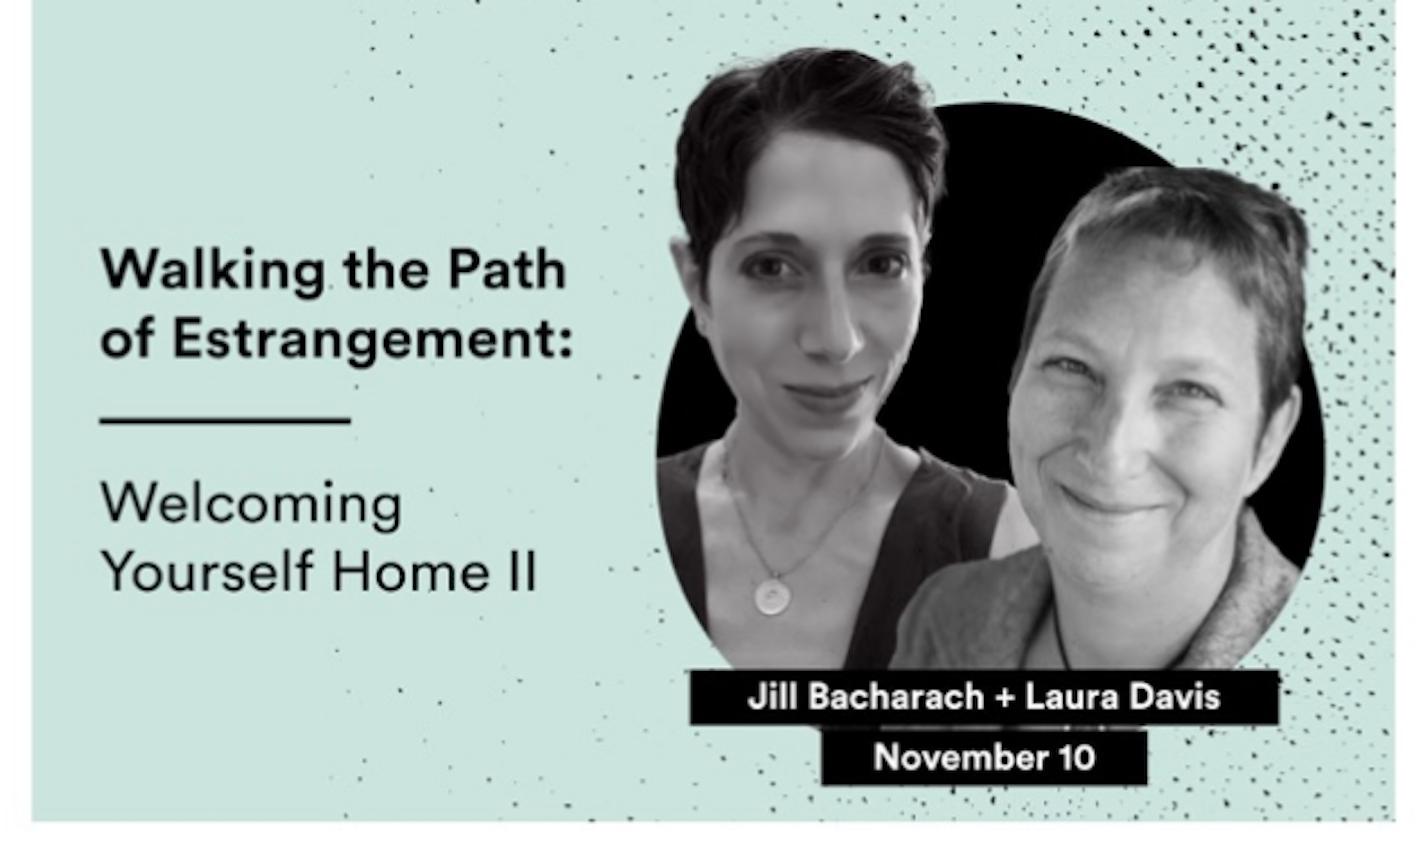 WALKING THE PATH OF ESTRANGEMENT: Welcoming Yourself Home II